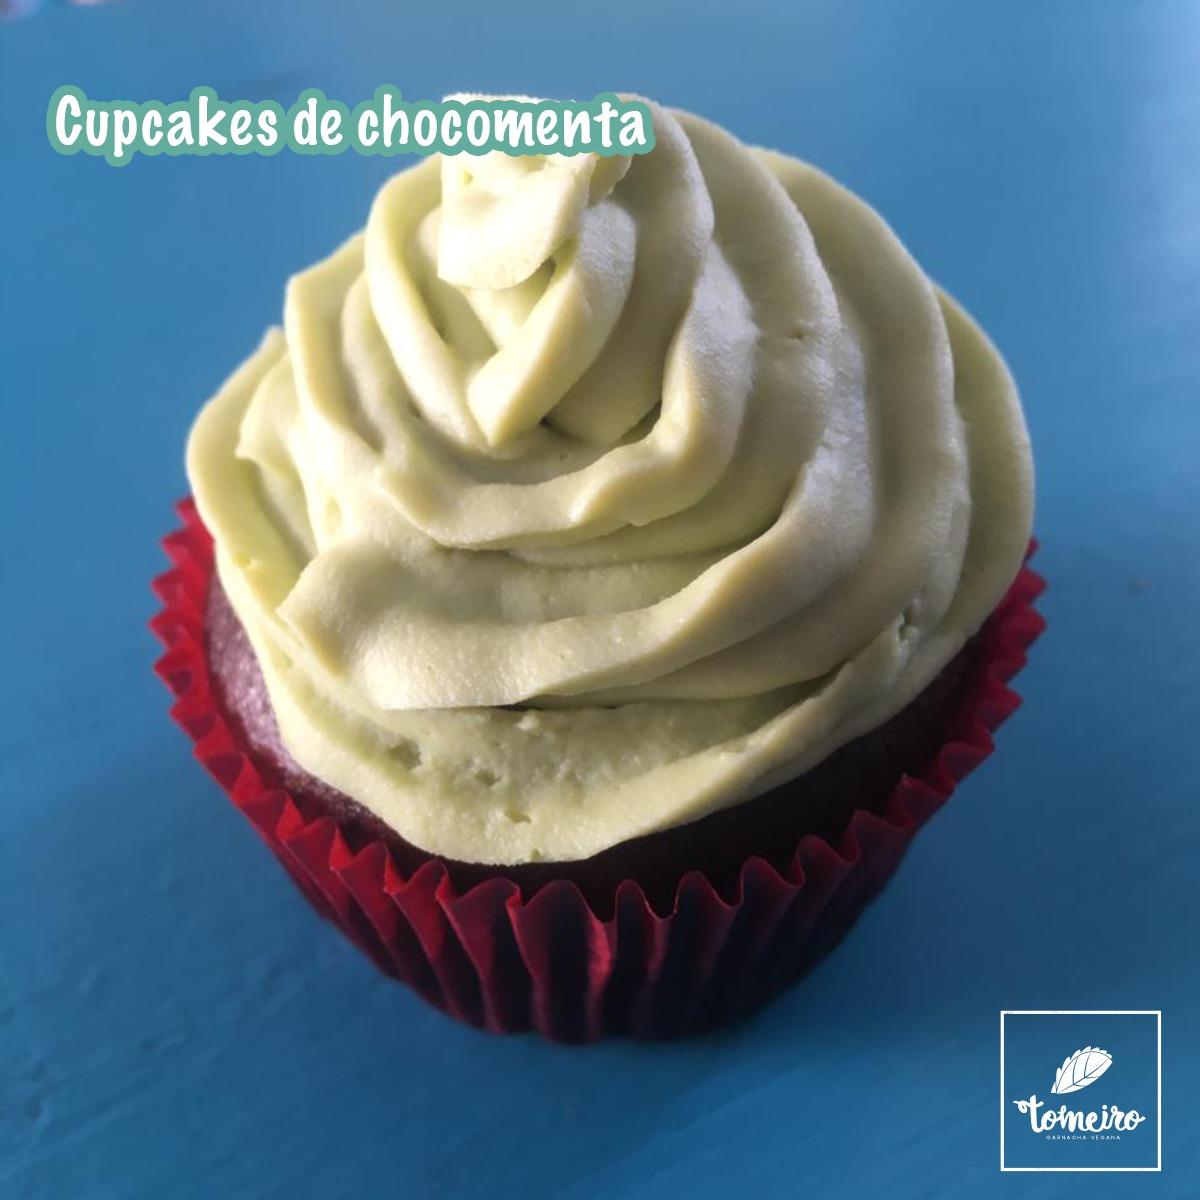 Cupcake de Chocomenta